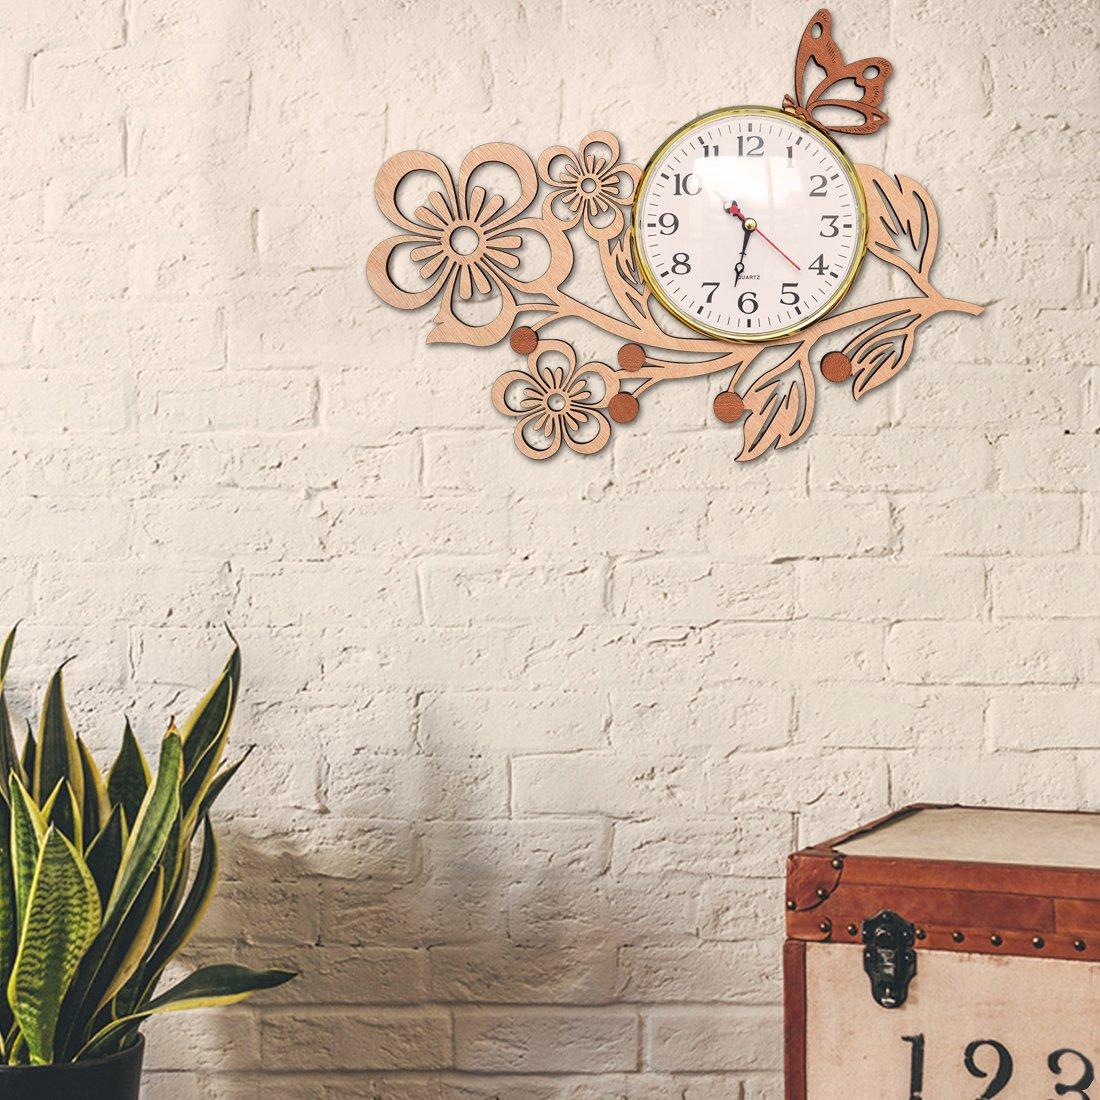 Giftgarden Butterfly Wall Clocks in Wood Five Petaled Flowers